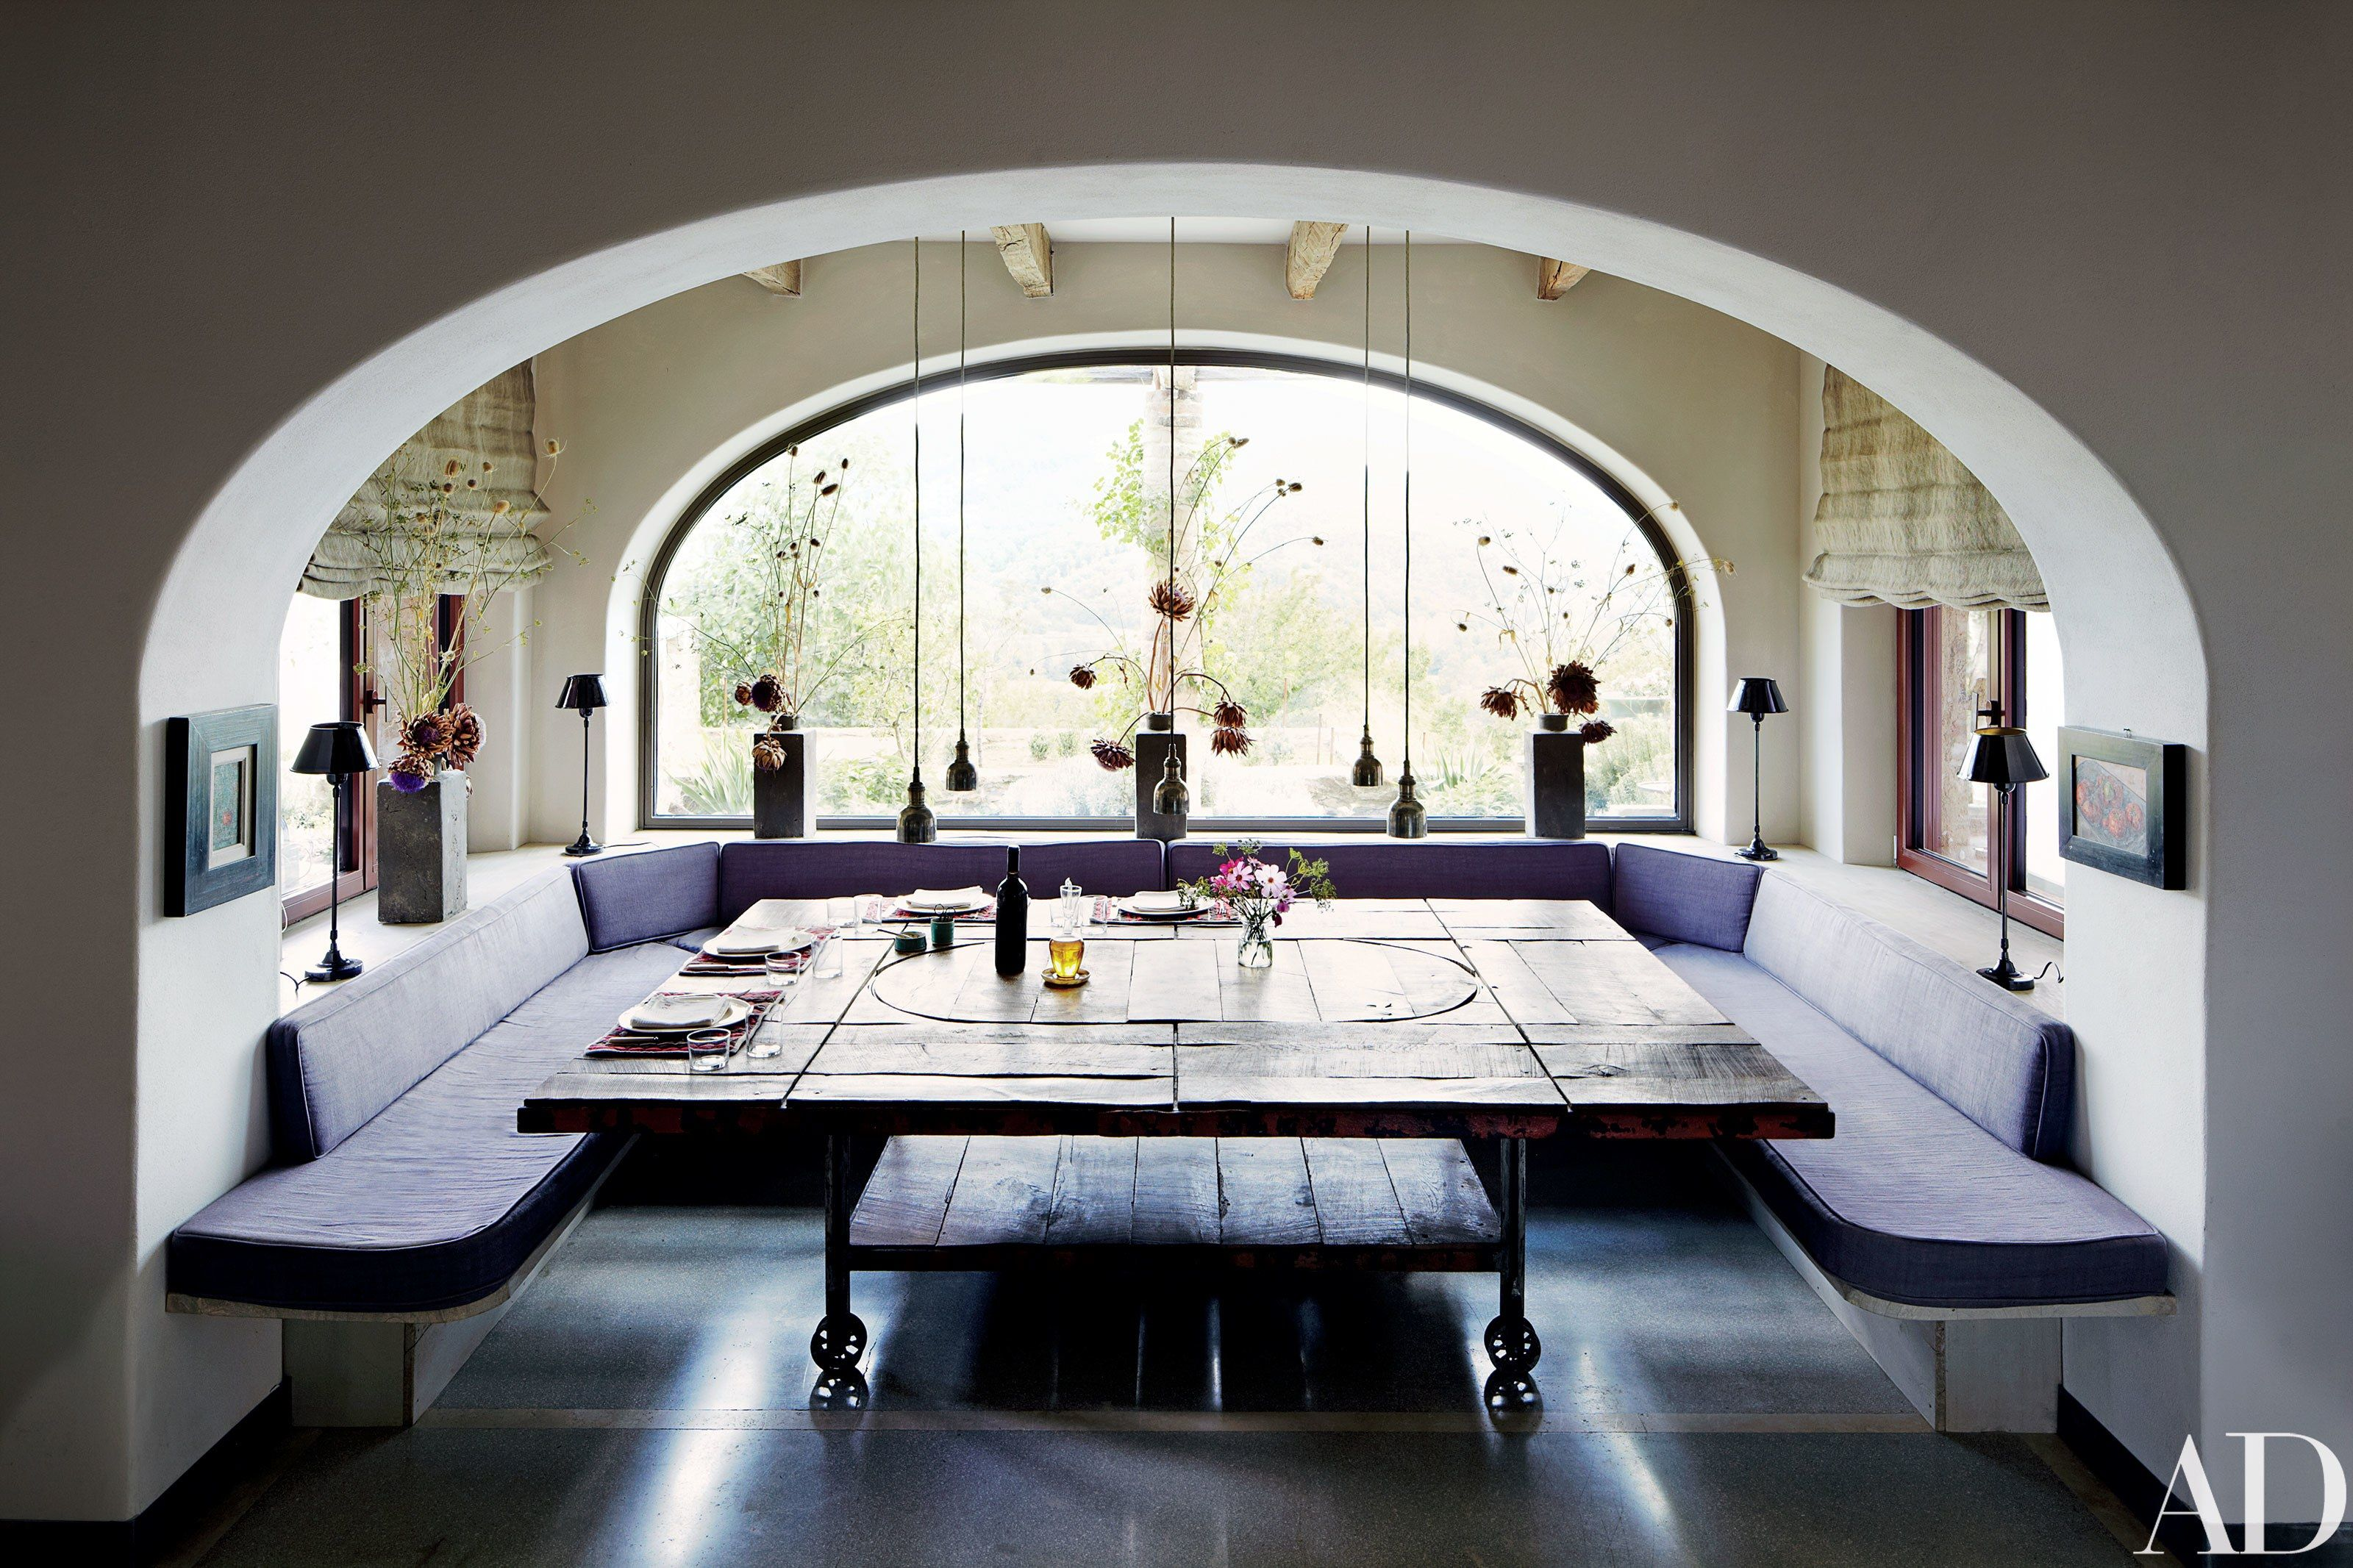 Inside The Transformation Of A Rustic Italian Farmhouse